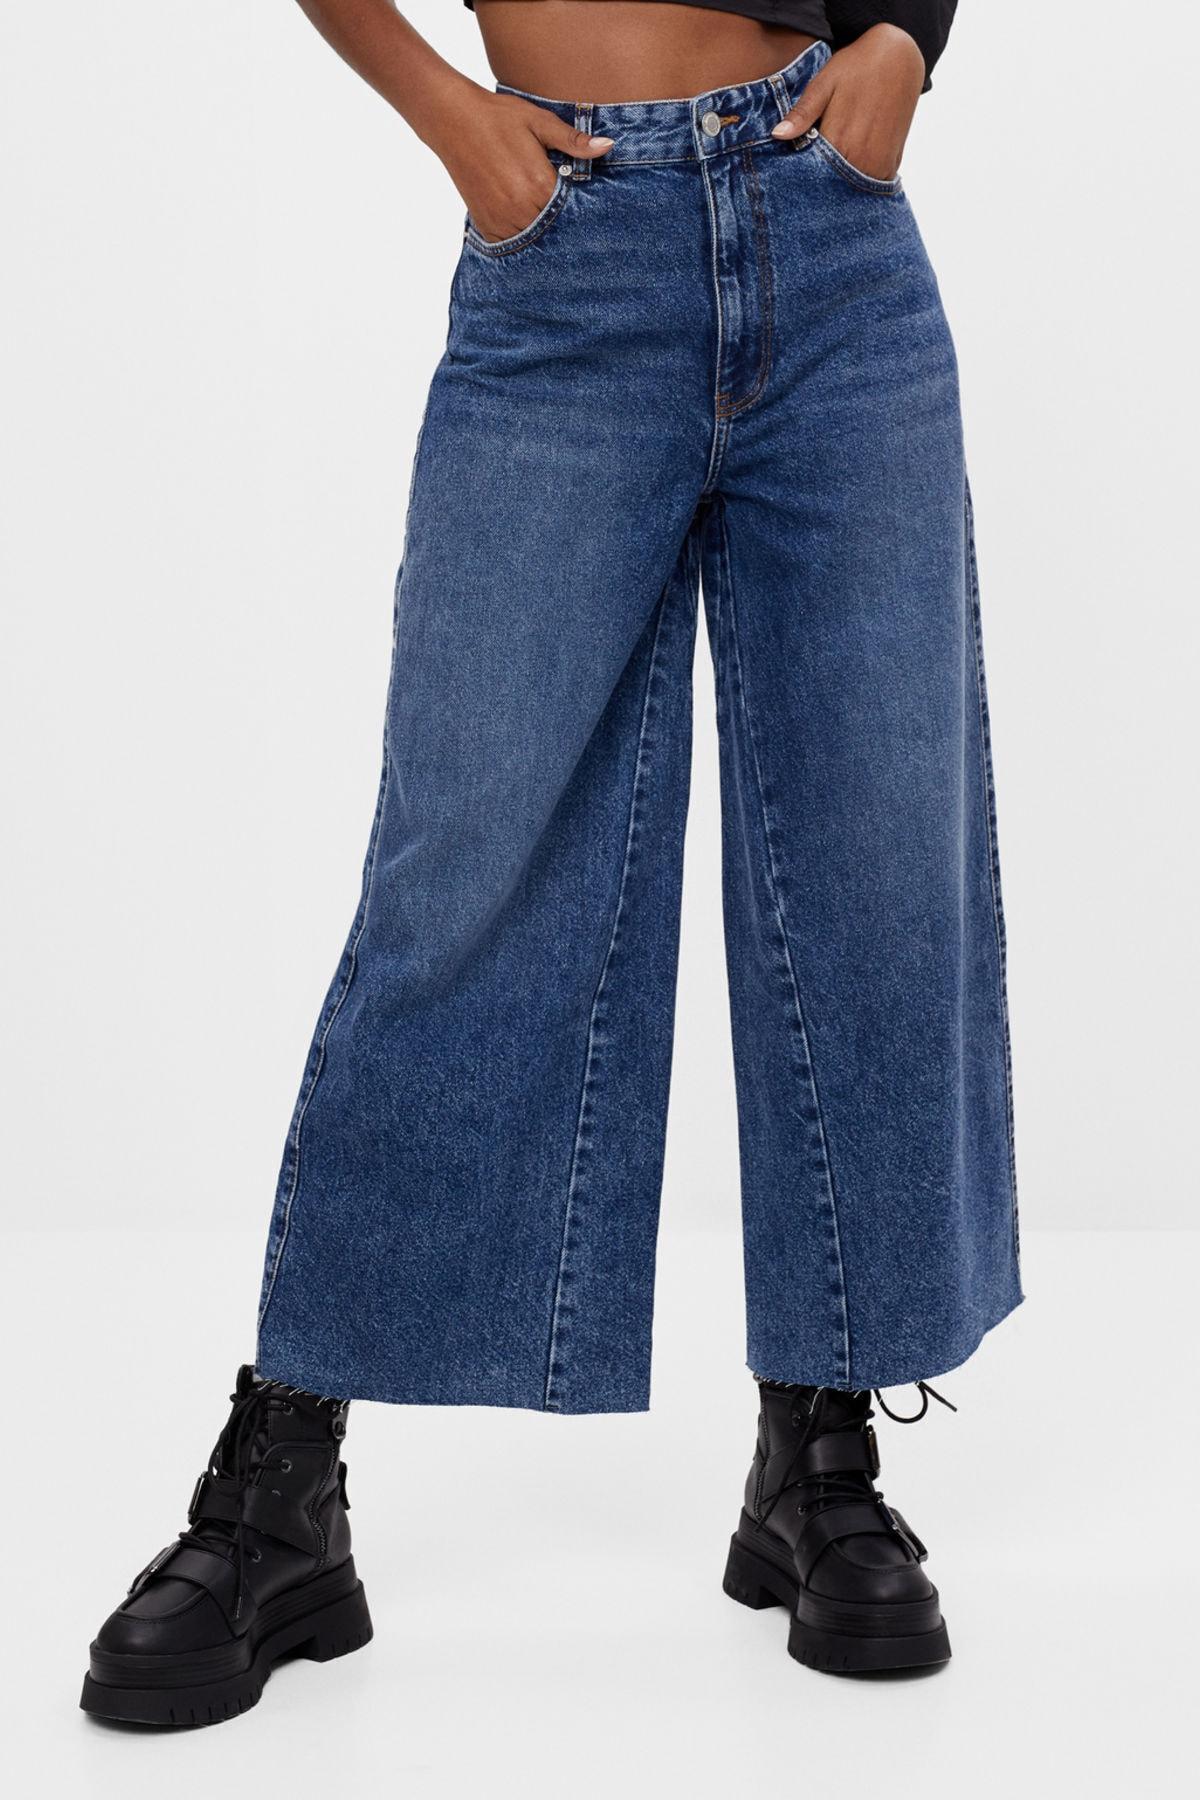 Bershka Kadın Lacivert Culotte Jean 1